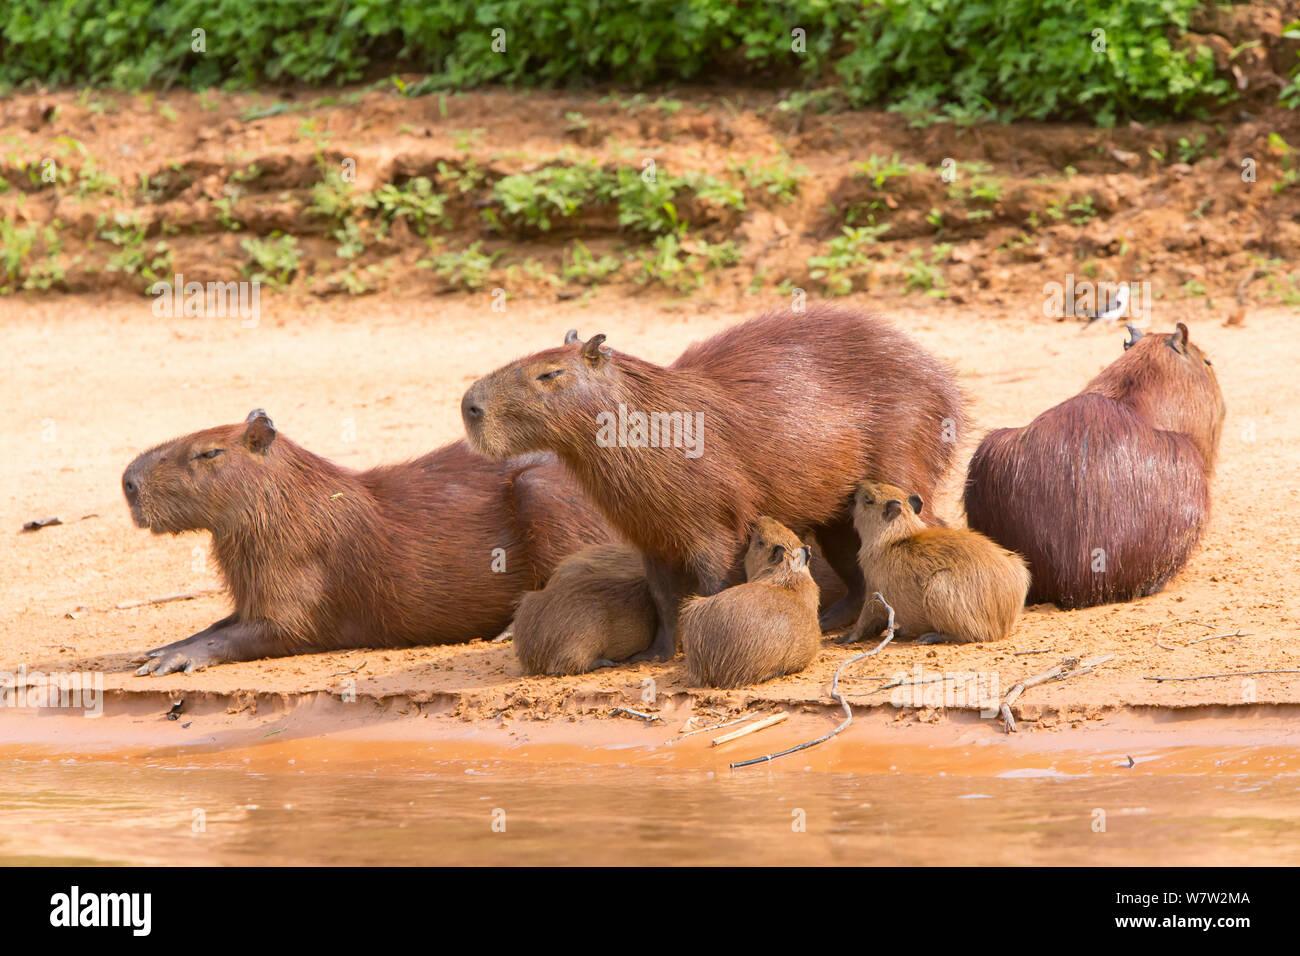 Capybara (Hydrochaeris hydrochaeris) family at water's edge, Pantanal, Brazil. Stock Photo